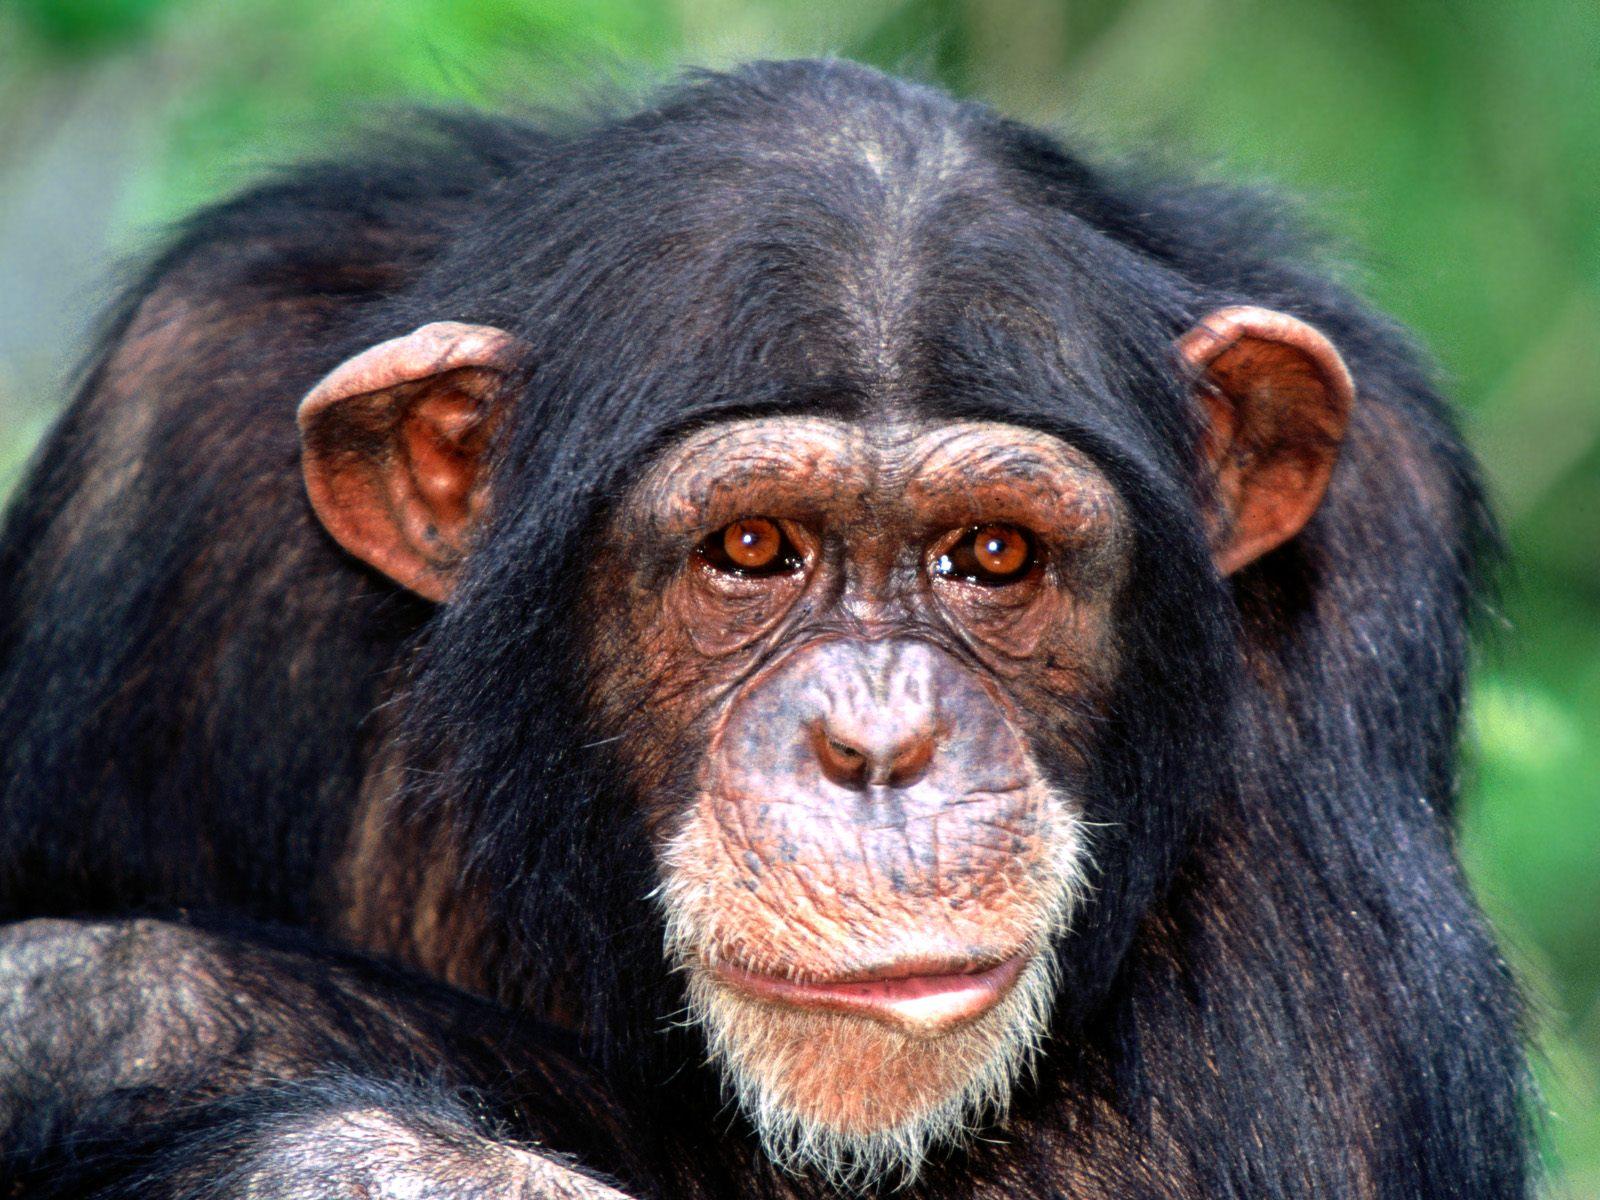 http://3.bp.blogspot.com/-Ye5kt90HjkY/T6k_Hlt7n4I/AAAAAAAAeC0/T_UdIbQmelA/s1600/All+Ears,+Chimpanzee.jpg